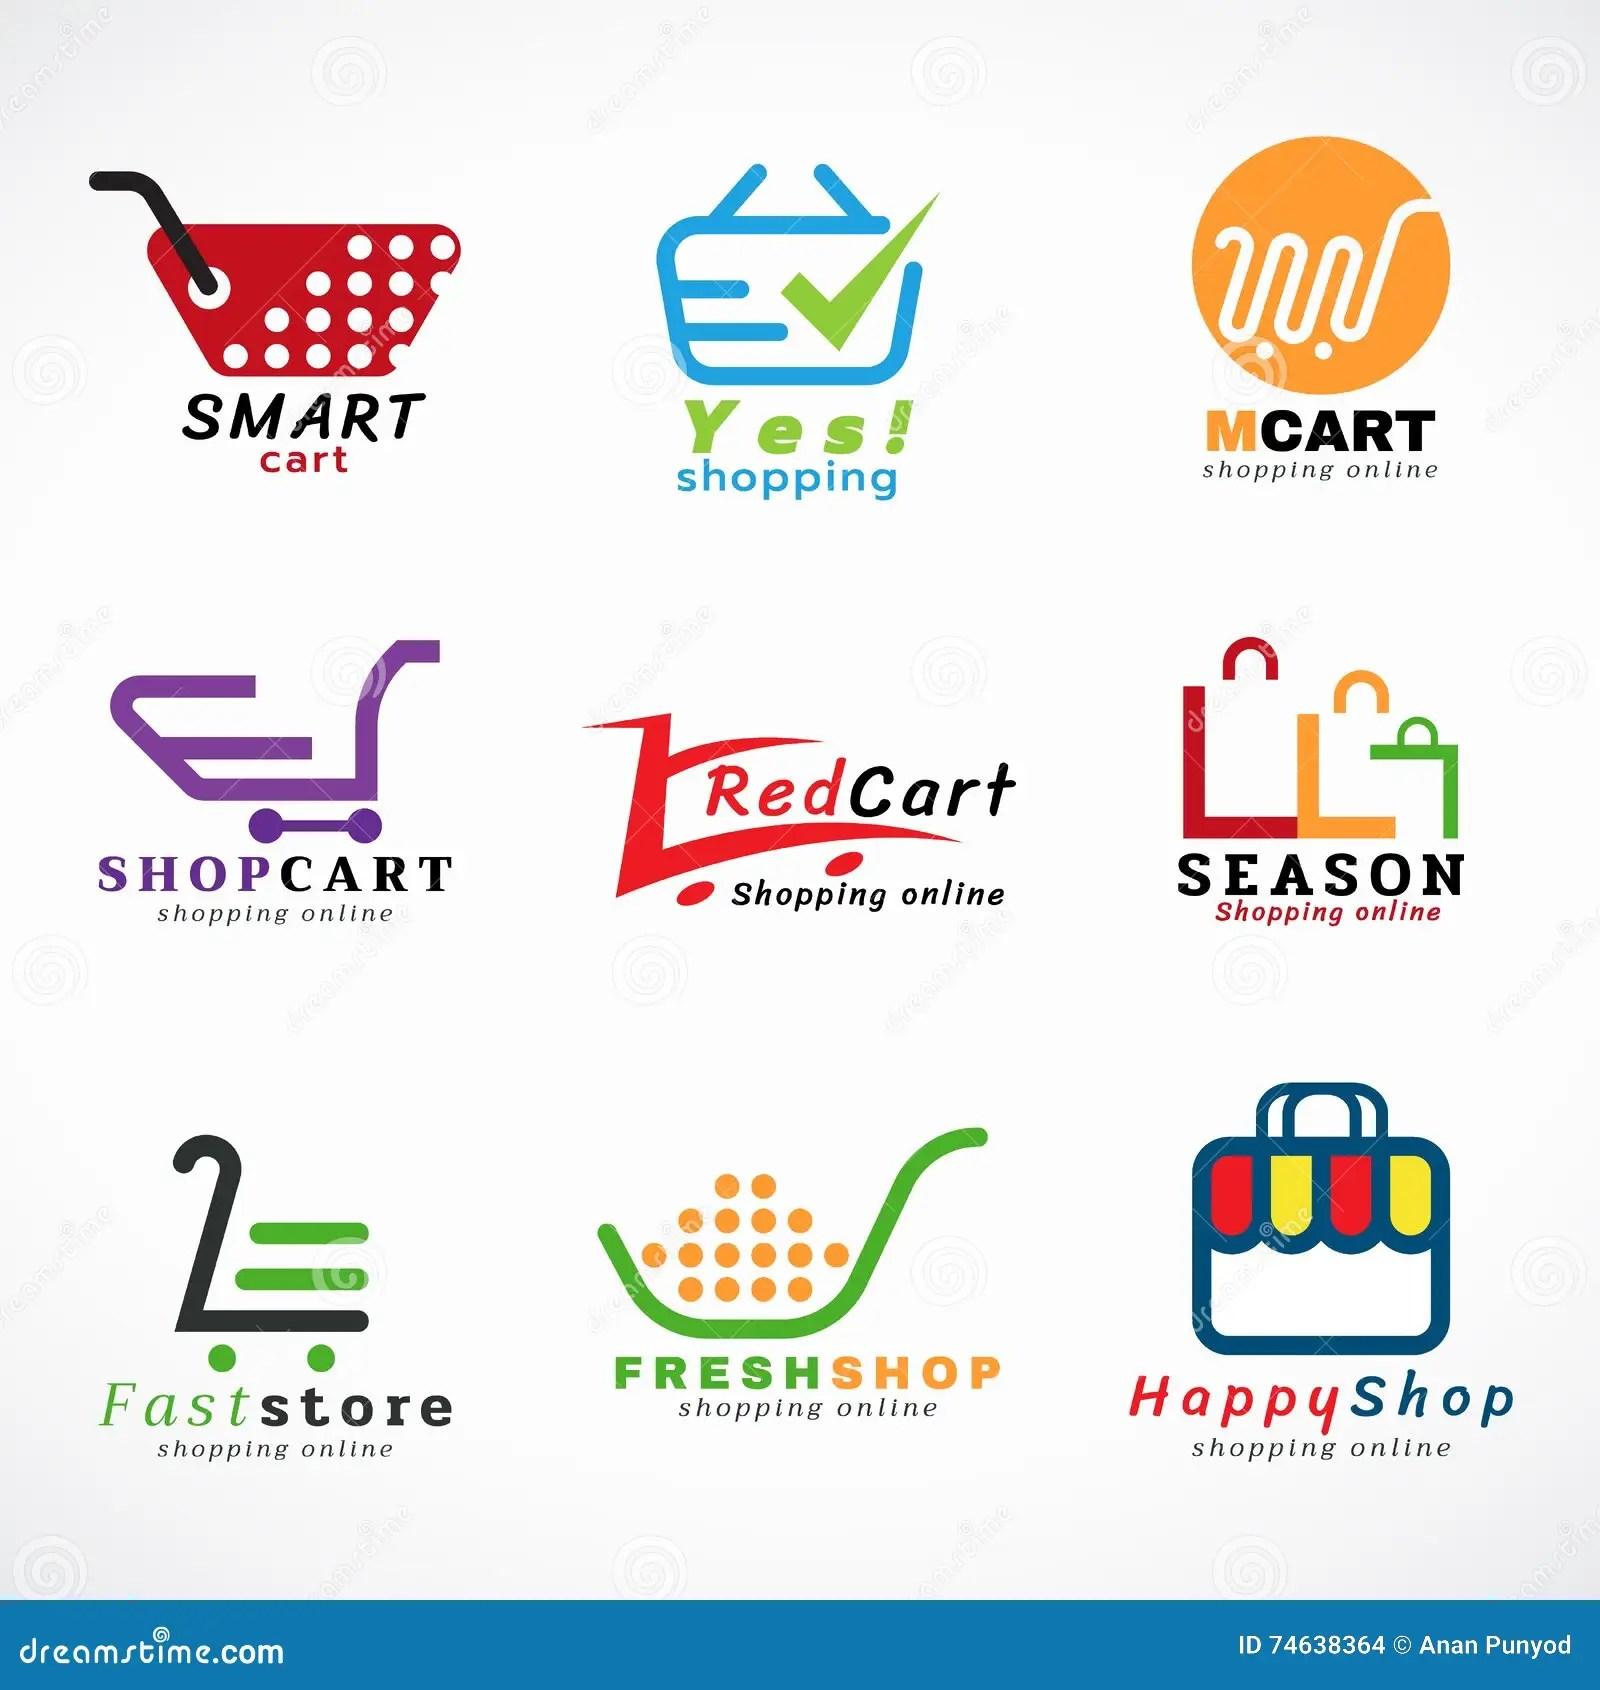 shopping cart logo and